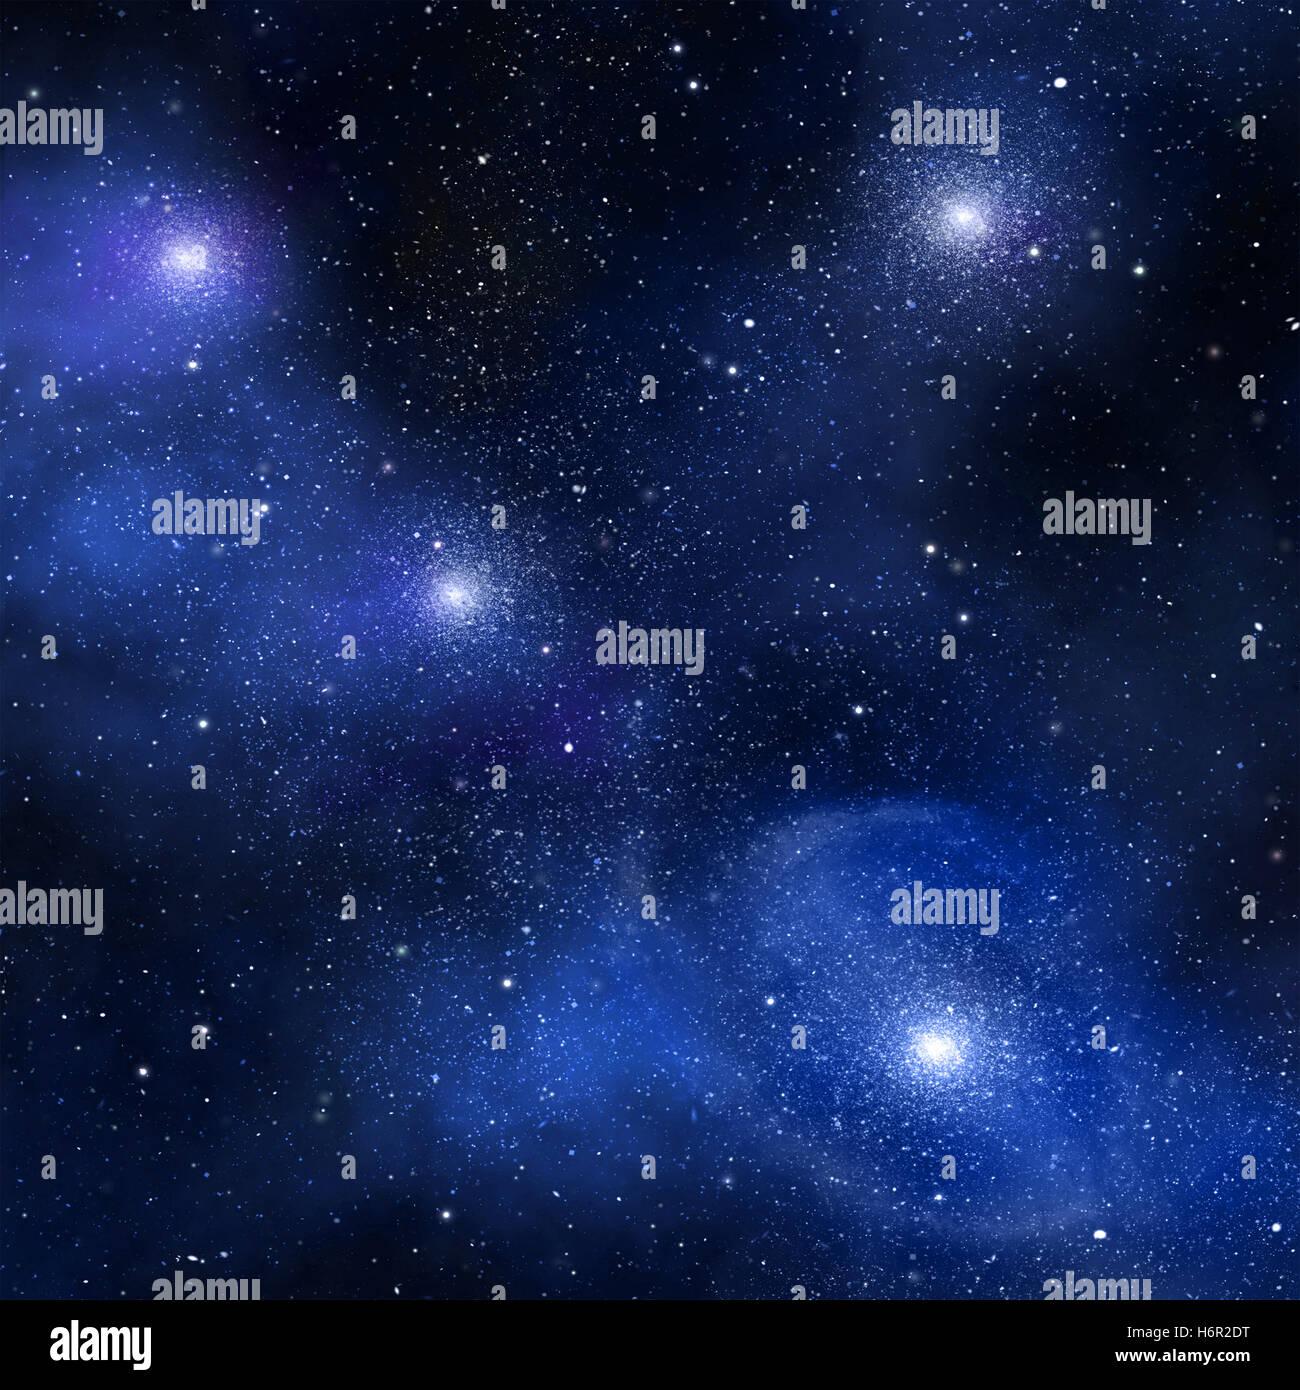 Popular Wallpaper Night Galaxy - space-night-nighttime-field-illustration-bright-shiny-deep-galaxy-H6R2DT  Collection-345026.jpg